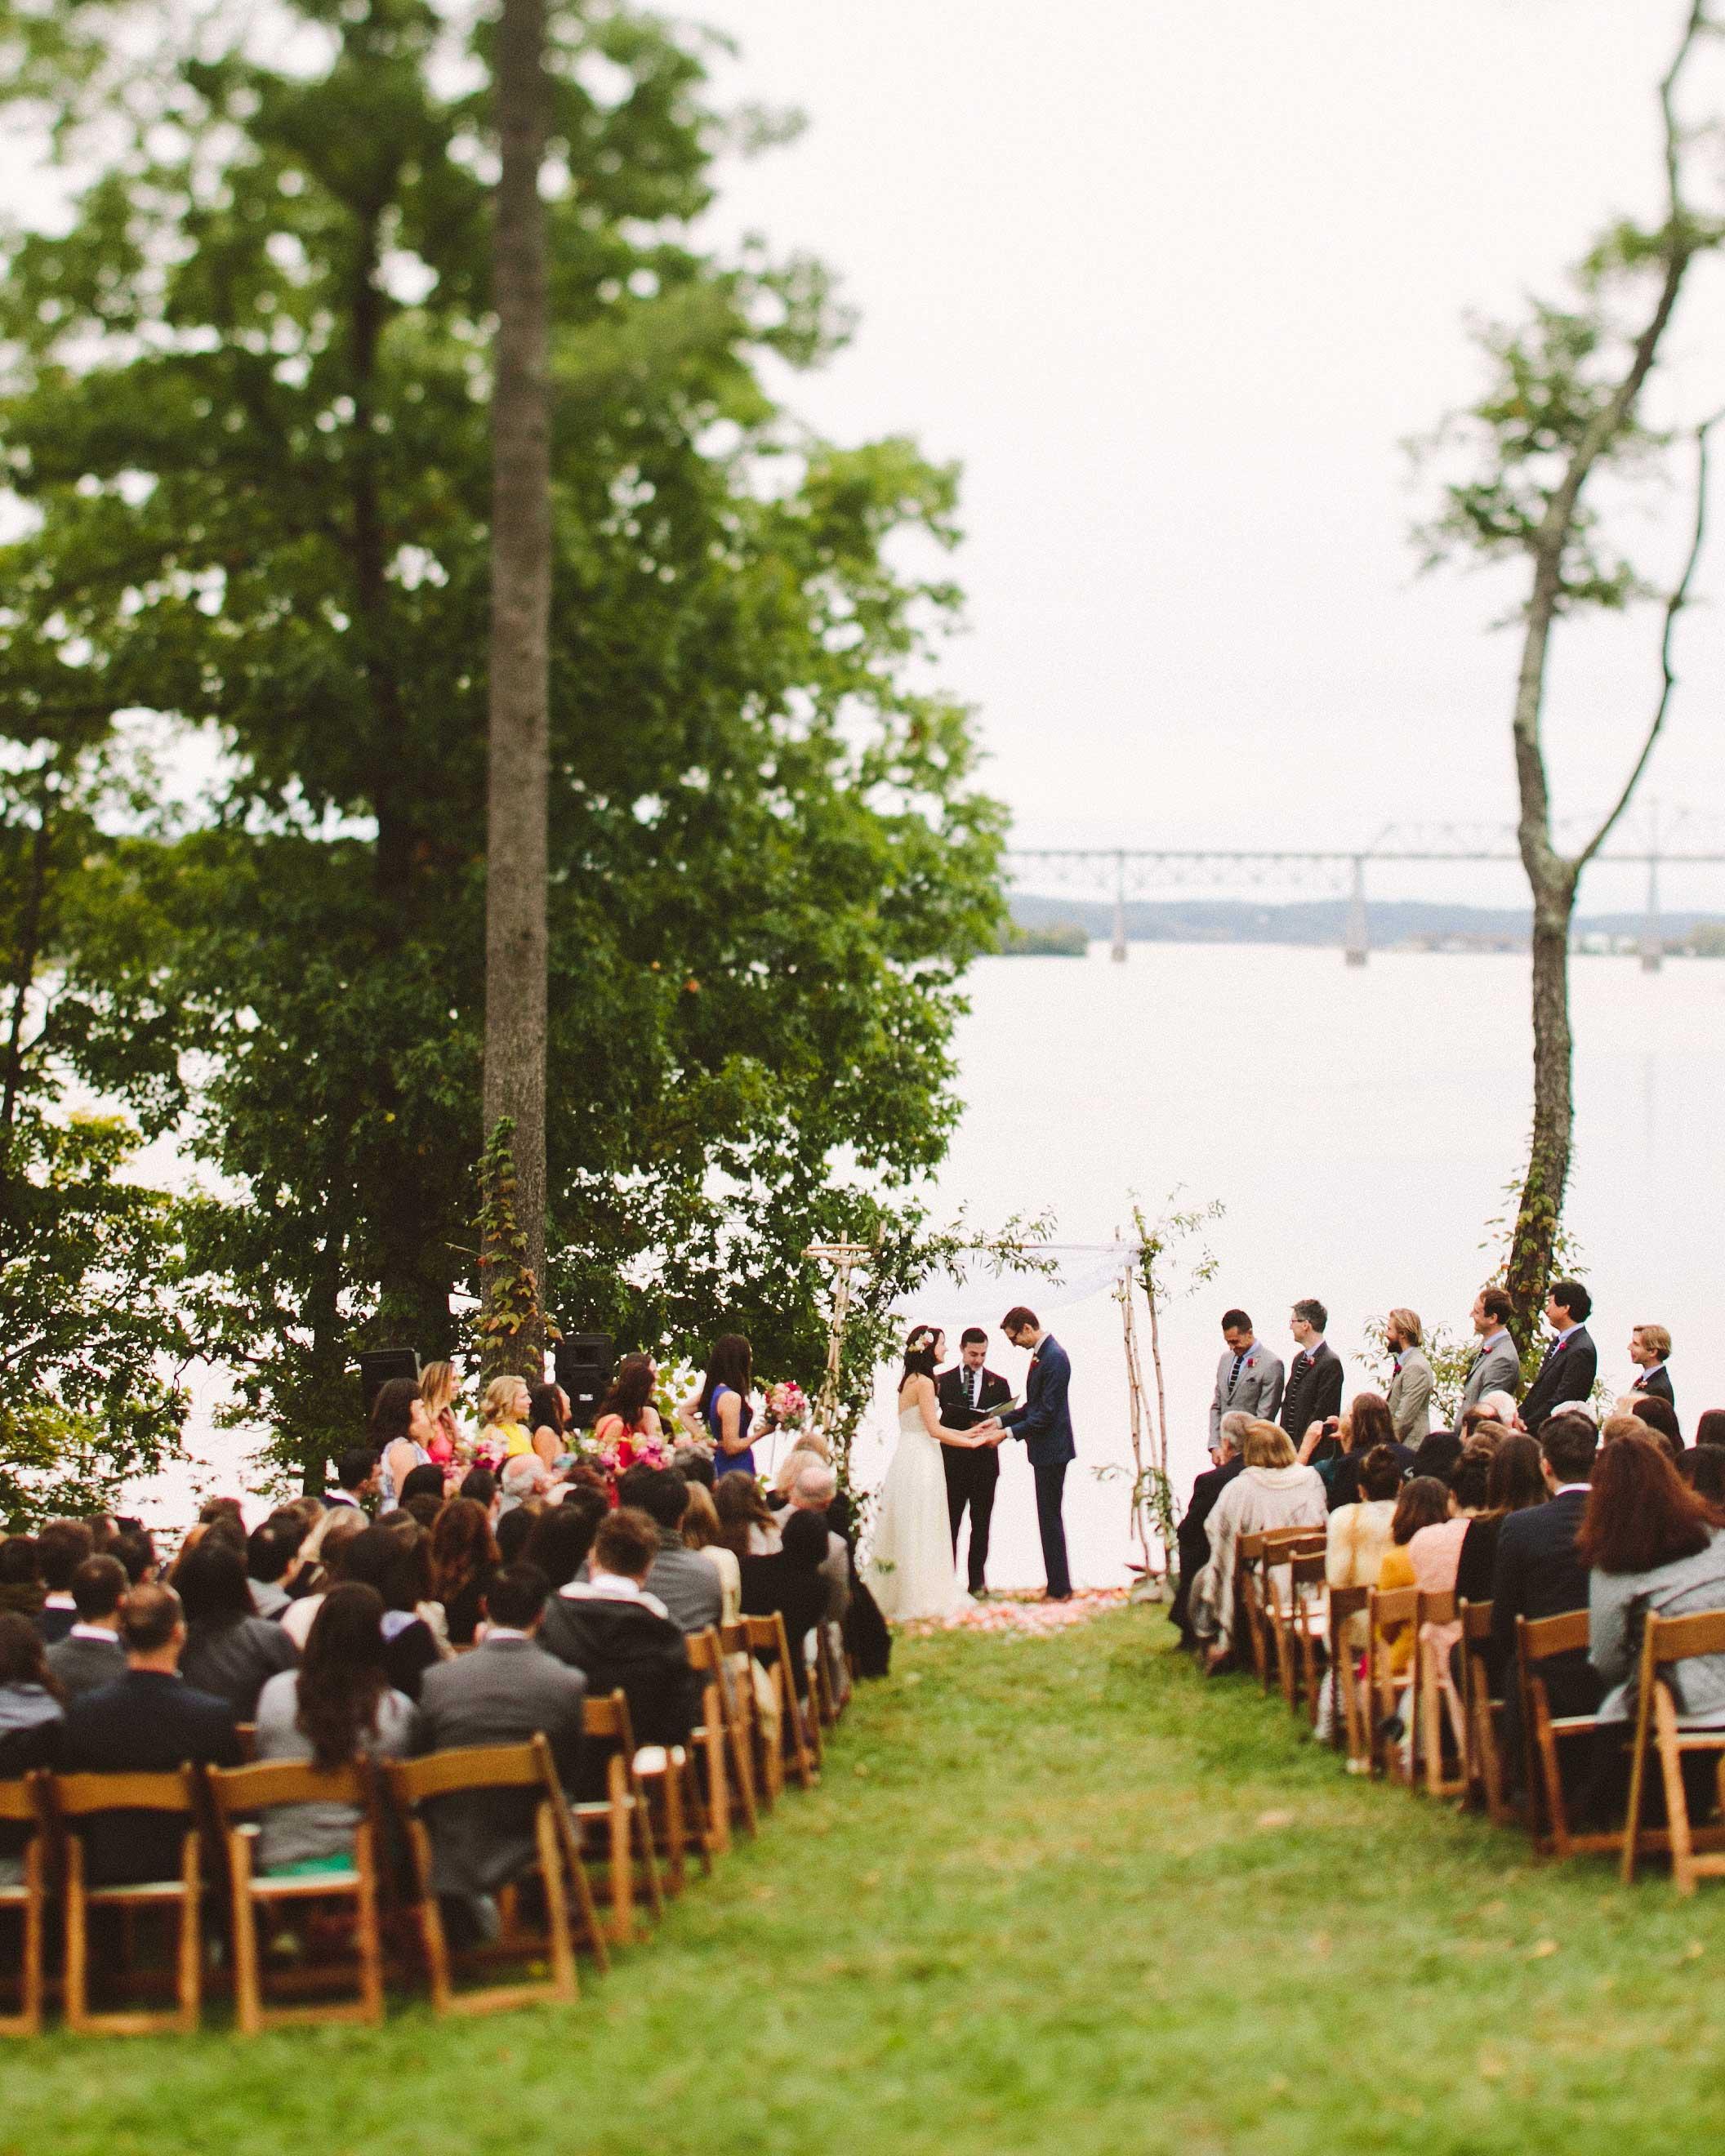 alisa-barrett-wedding-ceremony-588-s113048-0716.jpg